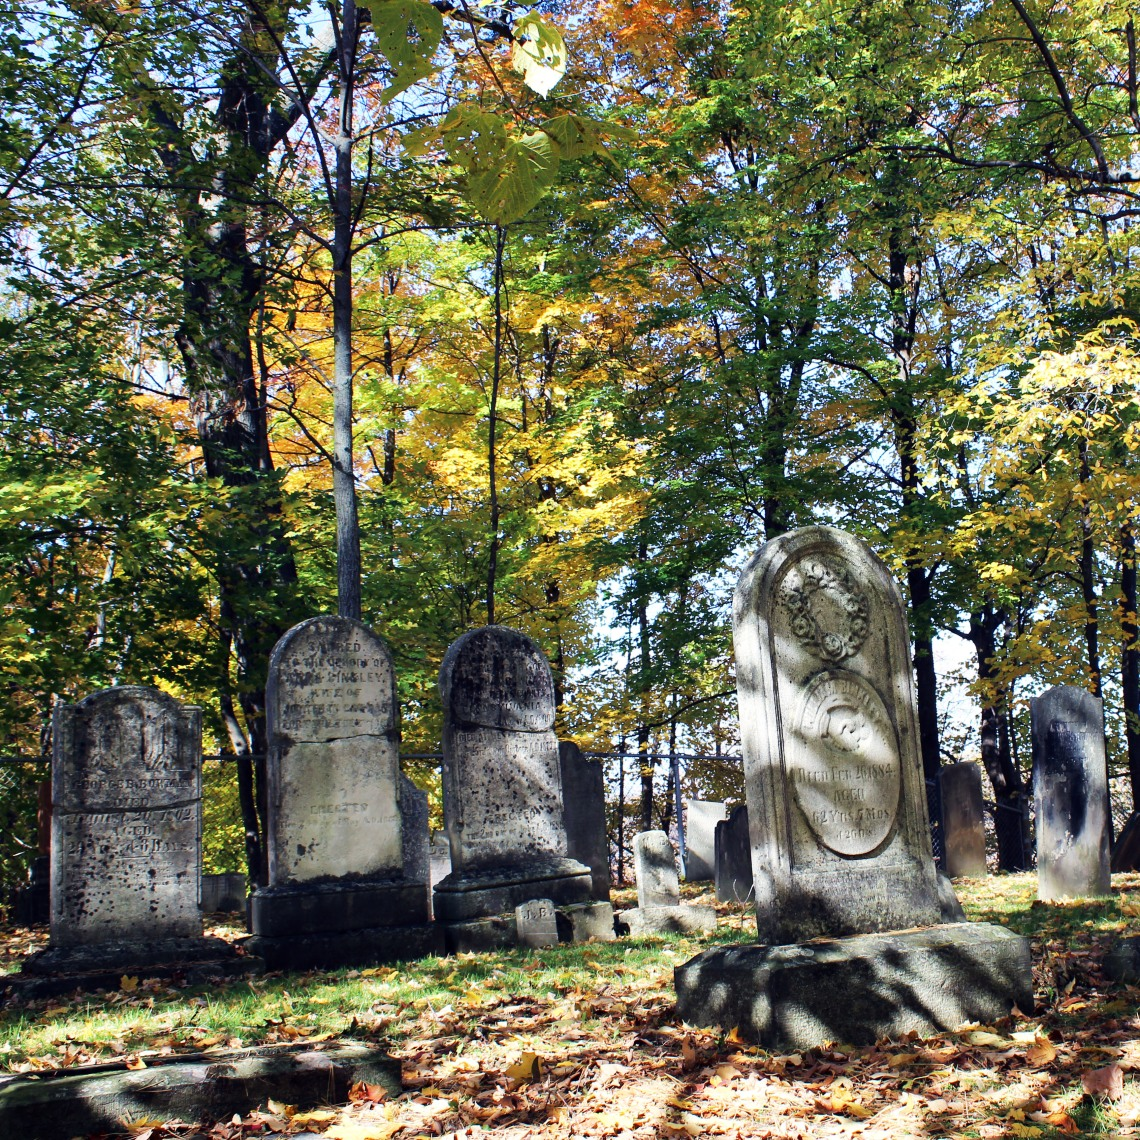 Binkley Pioneer Cemetery, Hamilton (Ont). Photo by @erskinec